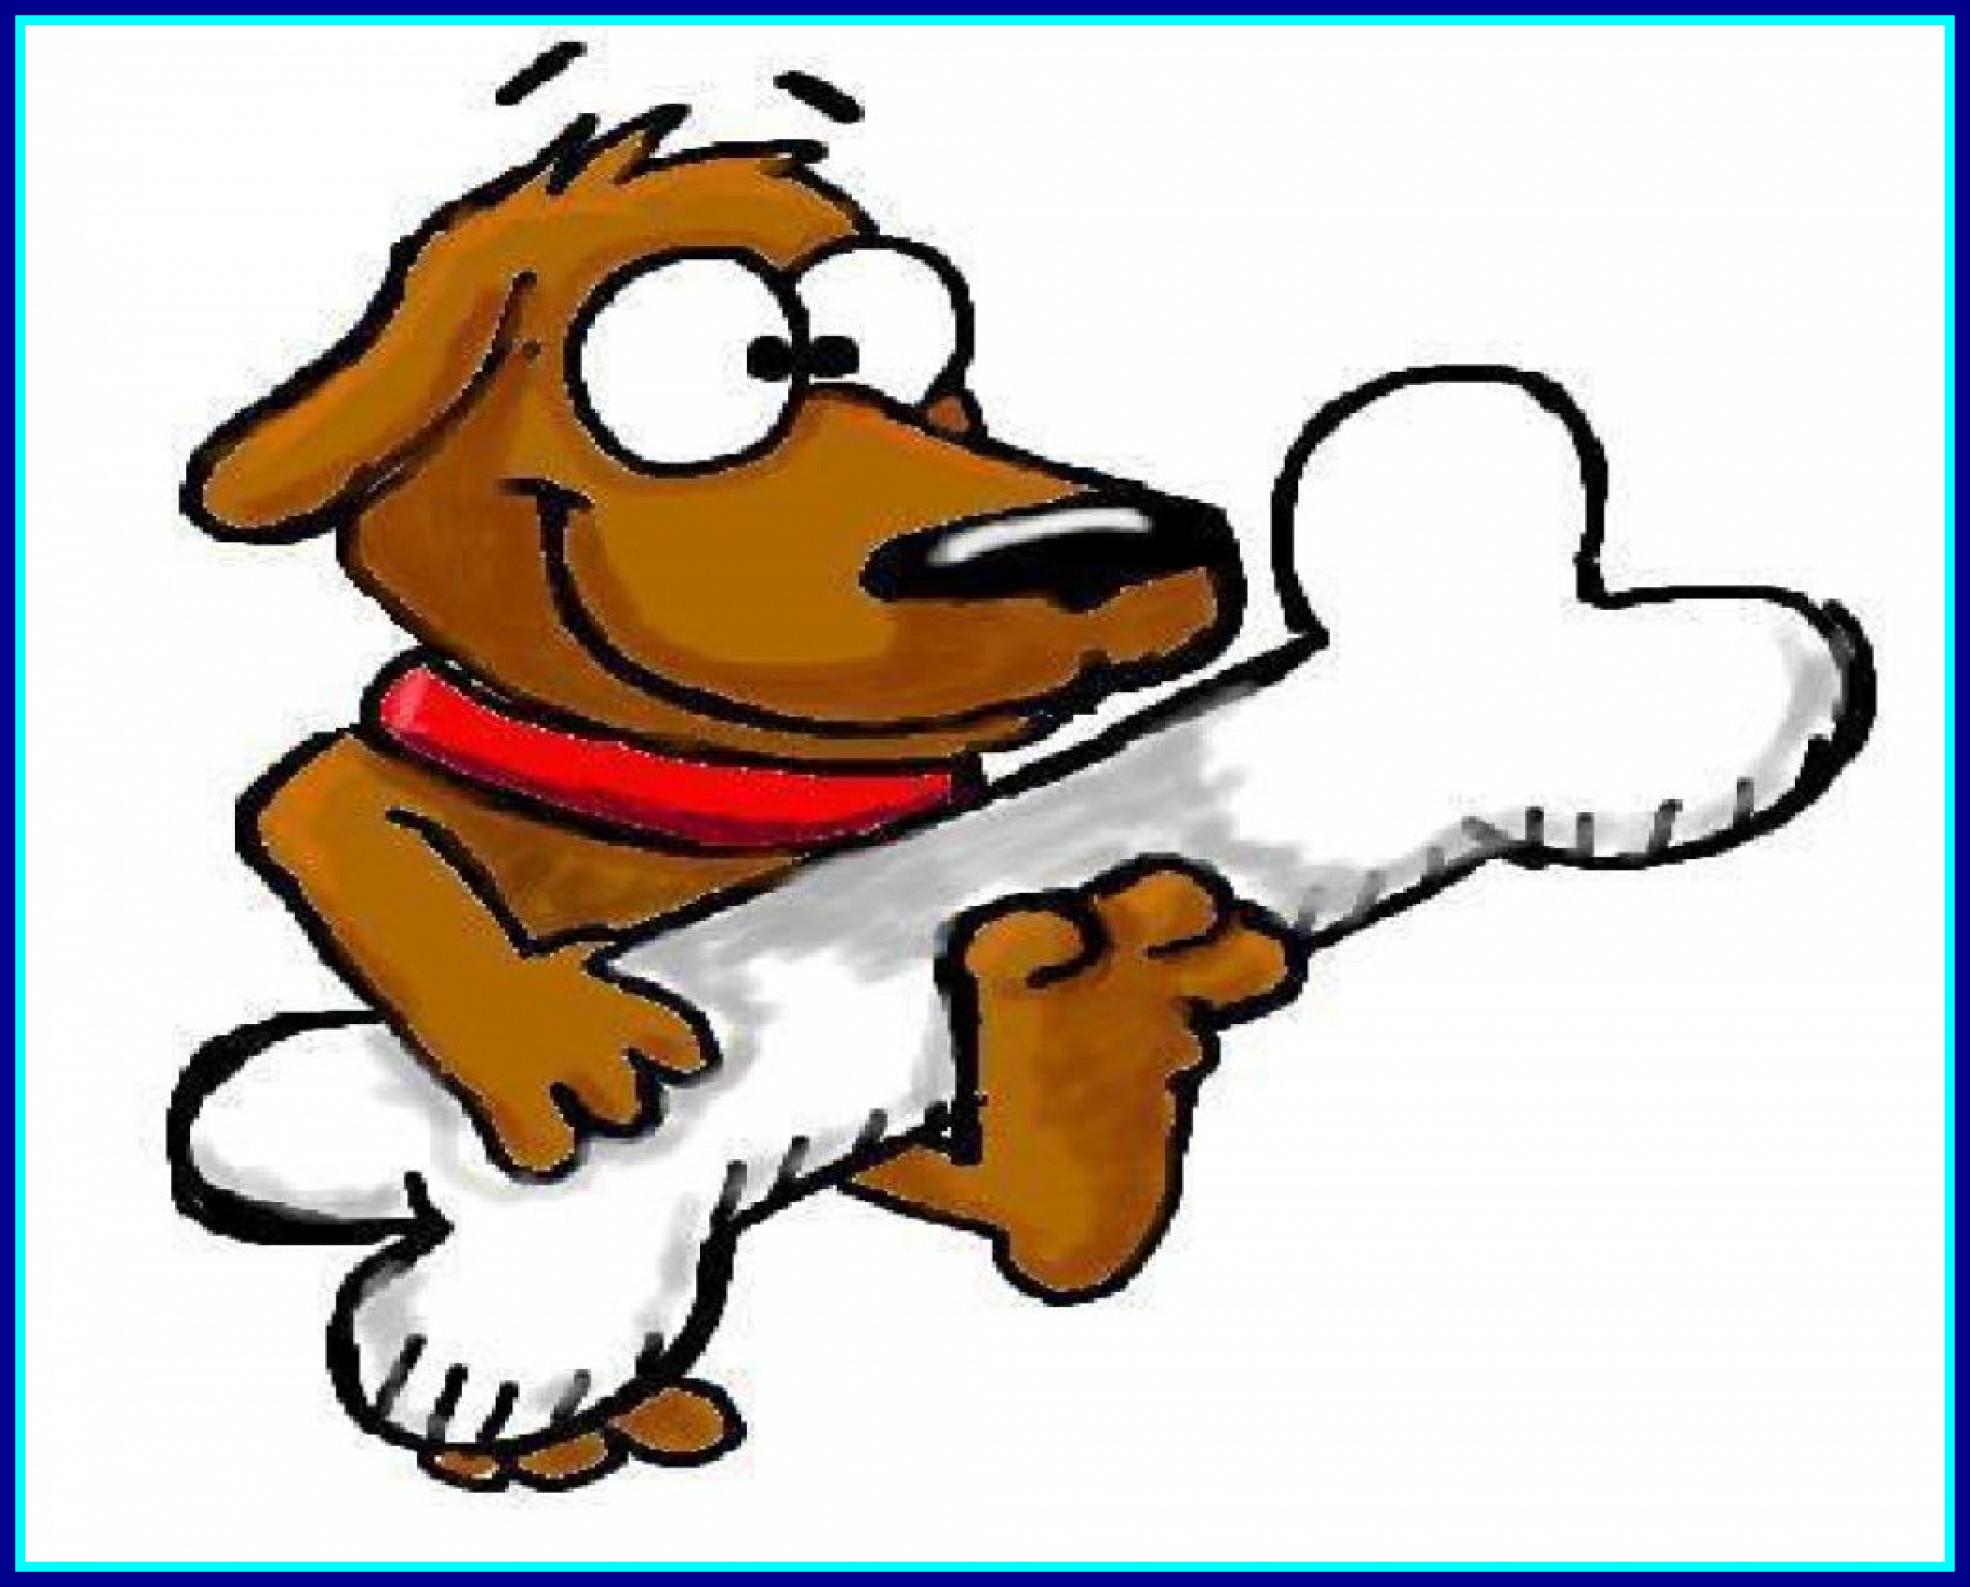 Inspiring dog cartoon stock. Bone clipart animated